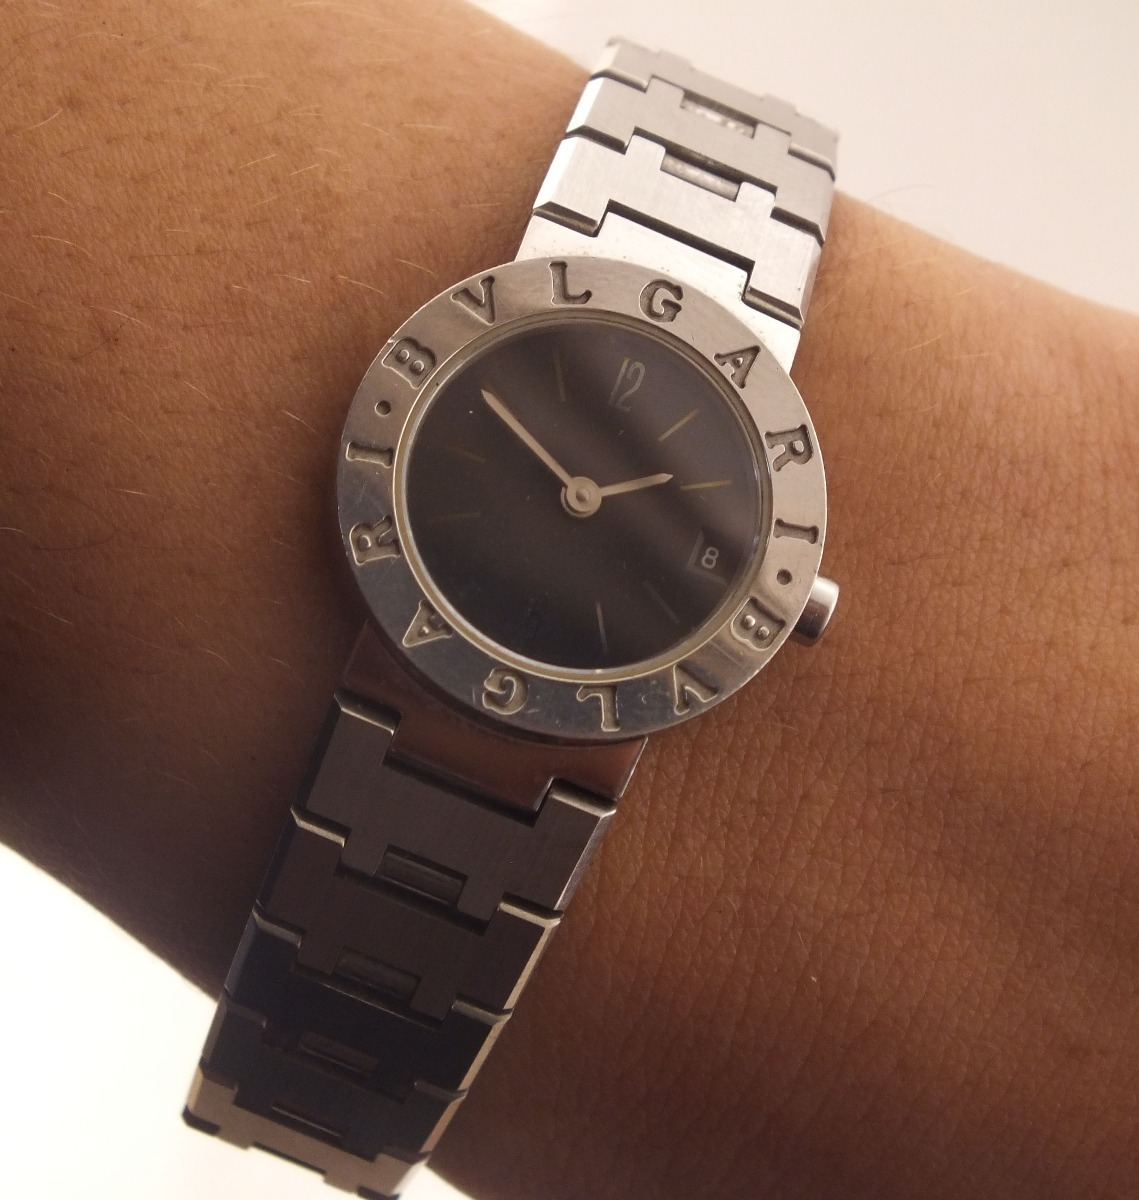 603bfdb1397 Relógio de pulso feminino bvlgari todo em aço carregando zoom jpg 1139x1200 Relogio  bvlgari feminino